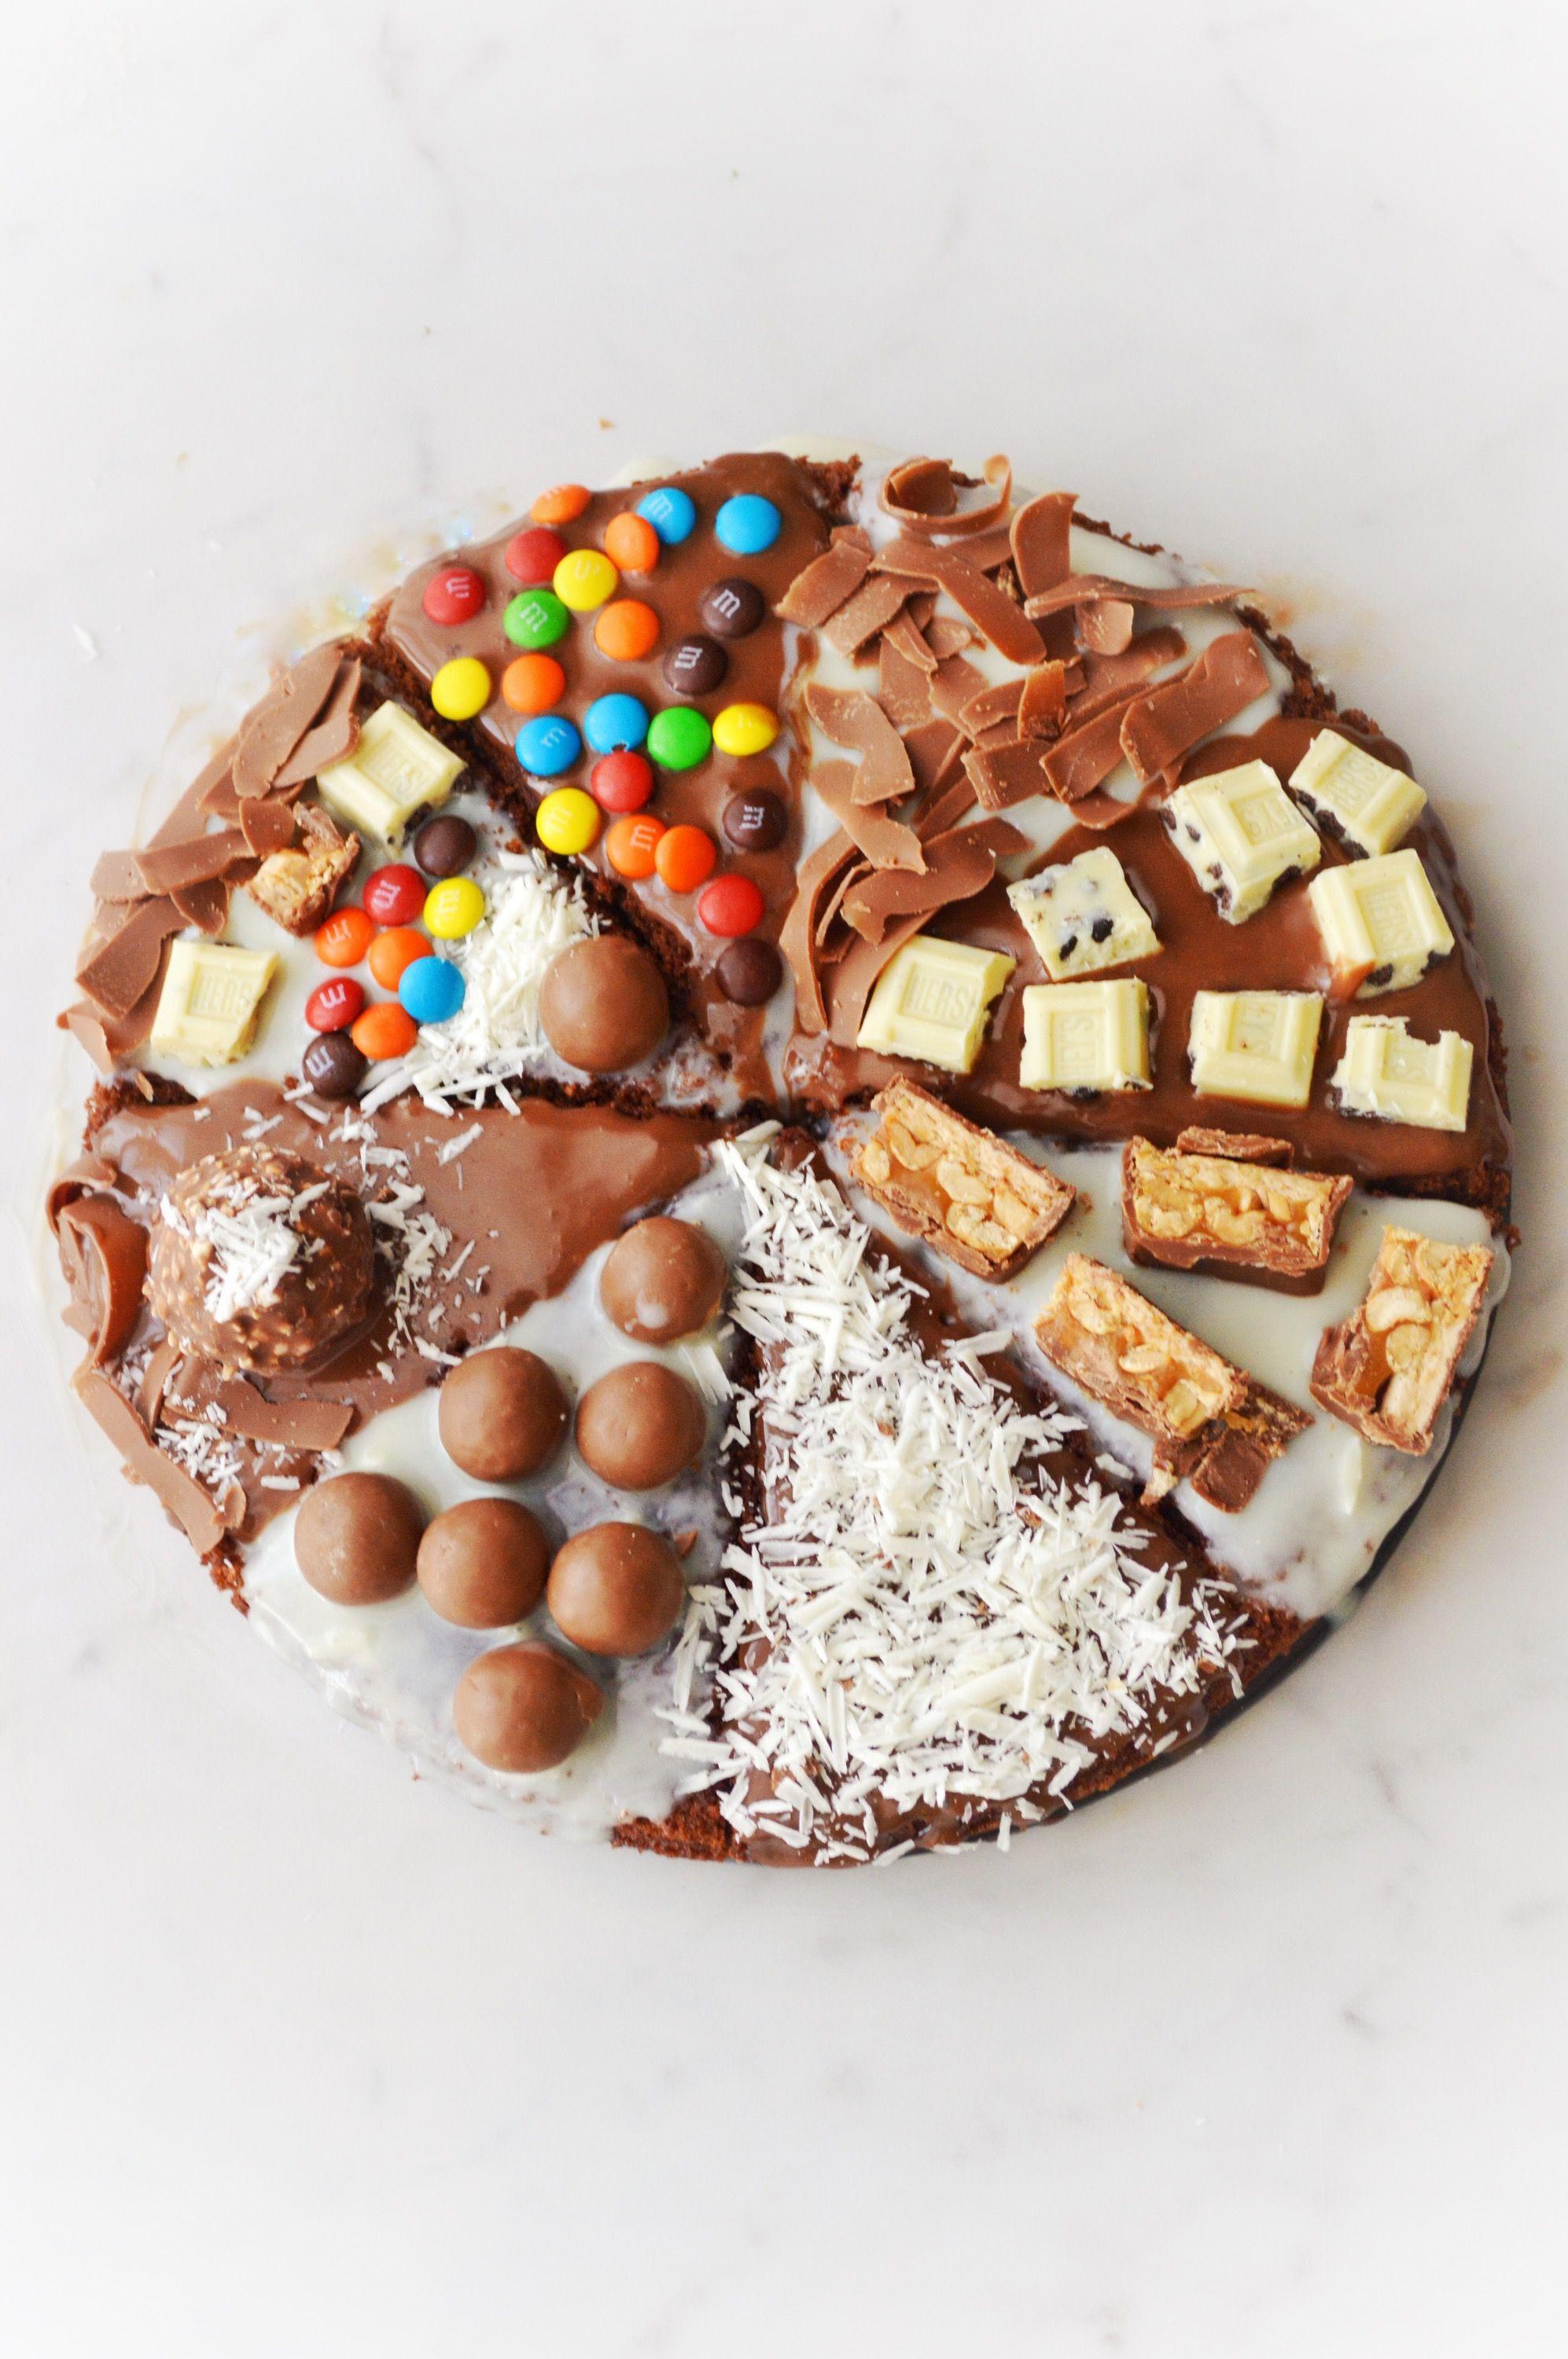 Chocolate Cake Pizza Savory Sweetfood Recipe Chocolate Pizza Desserts Candy Pizza